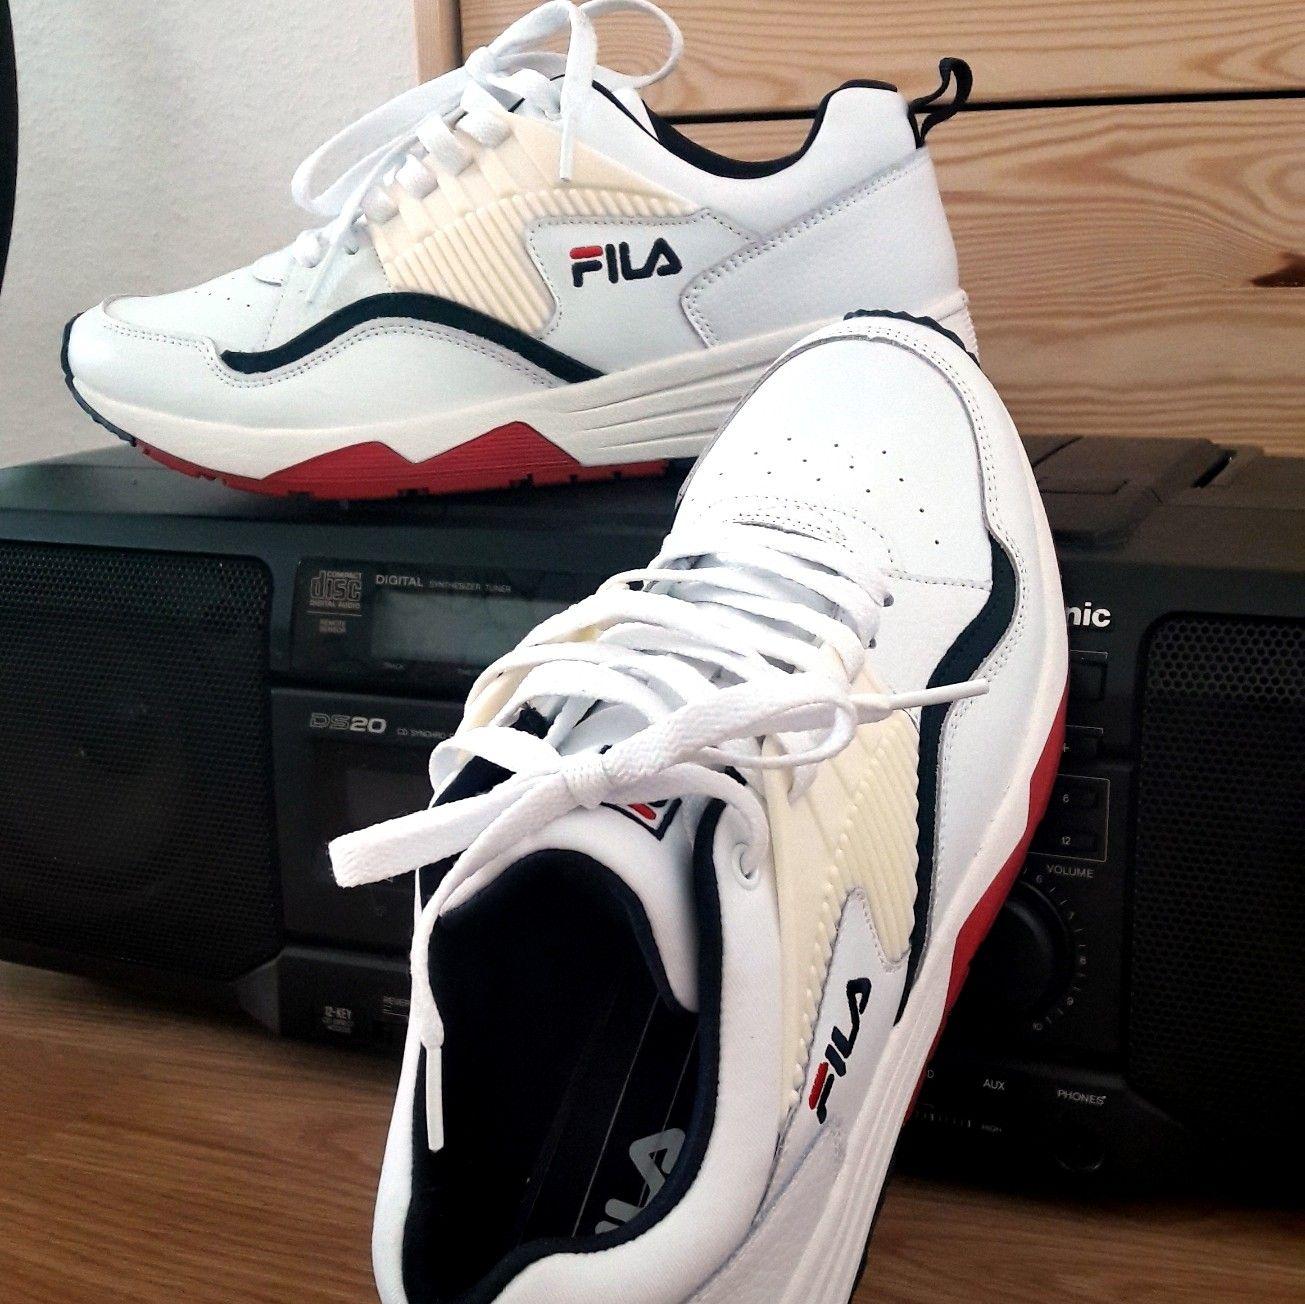 fila shoes hypebeast csgo t-shirts in bulk